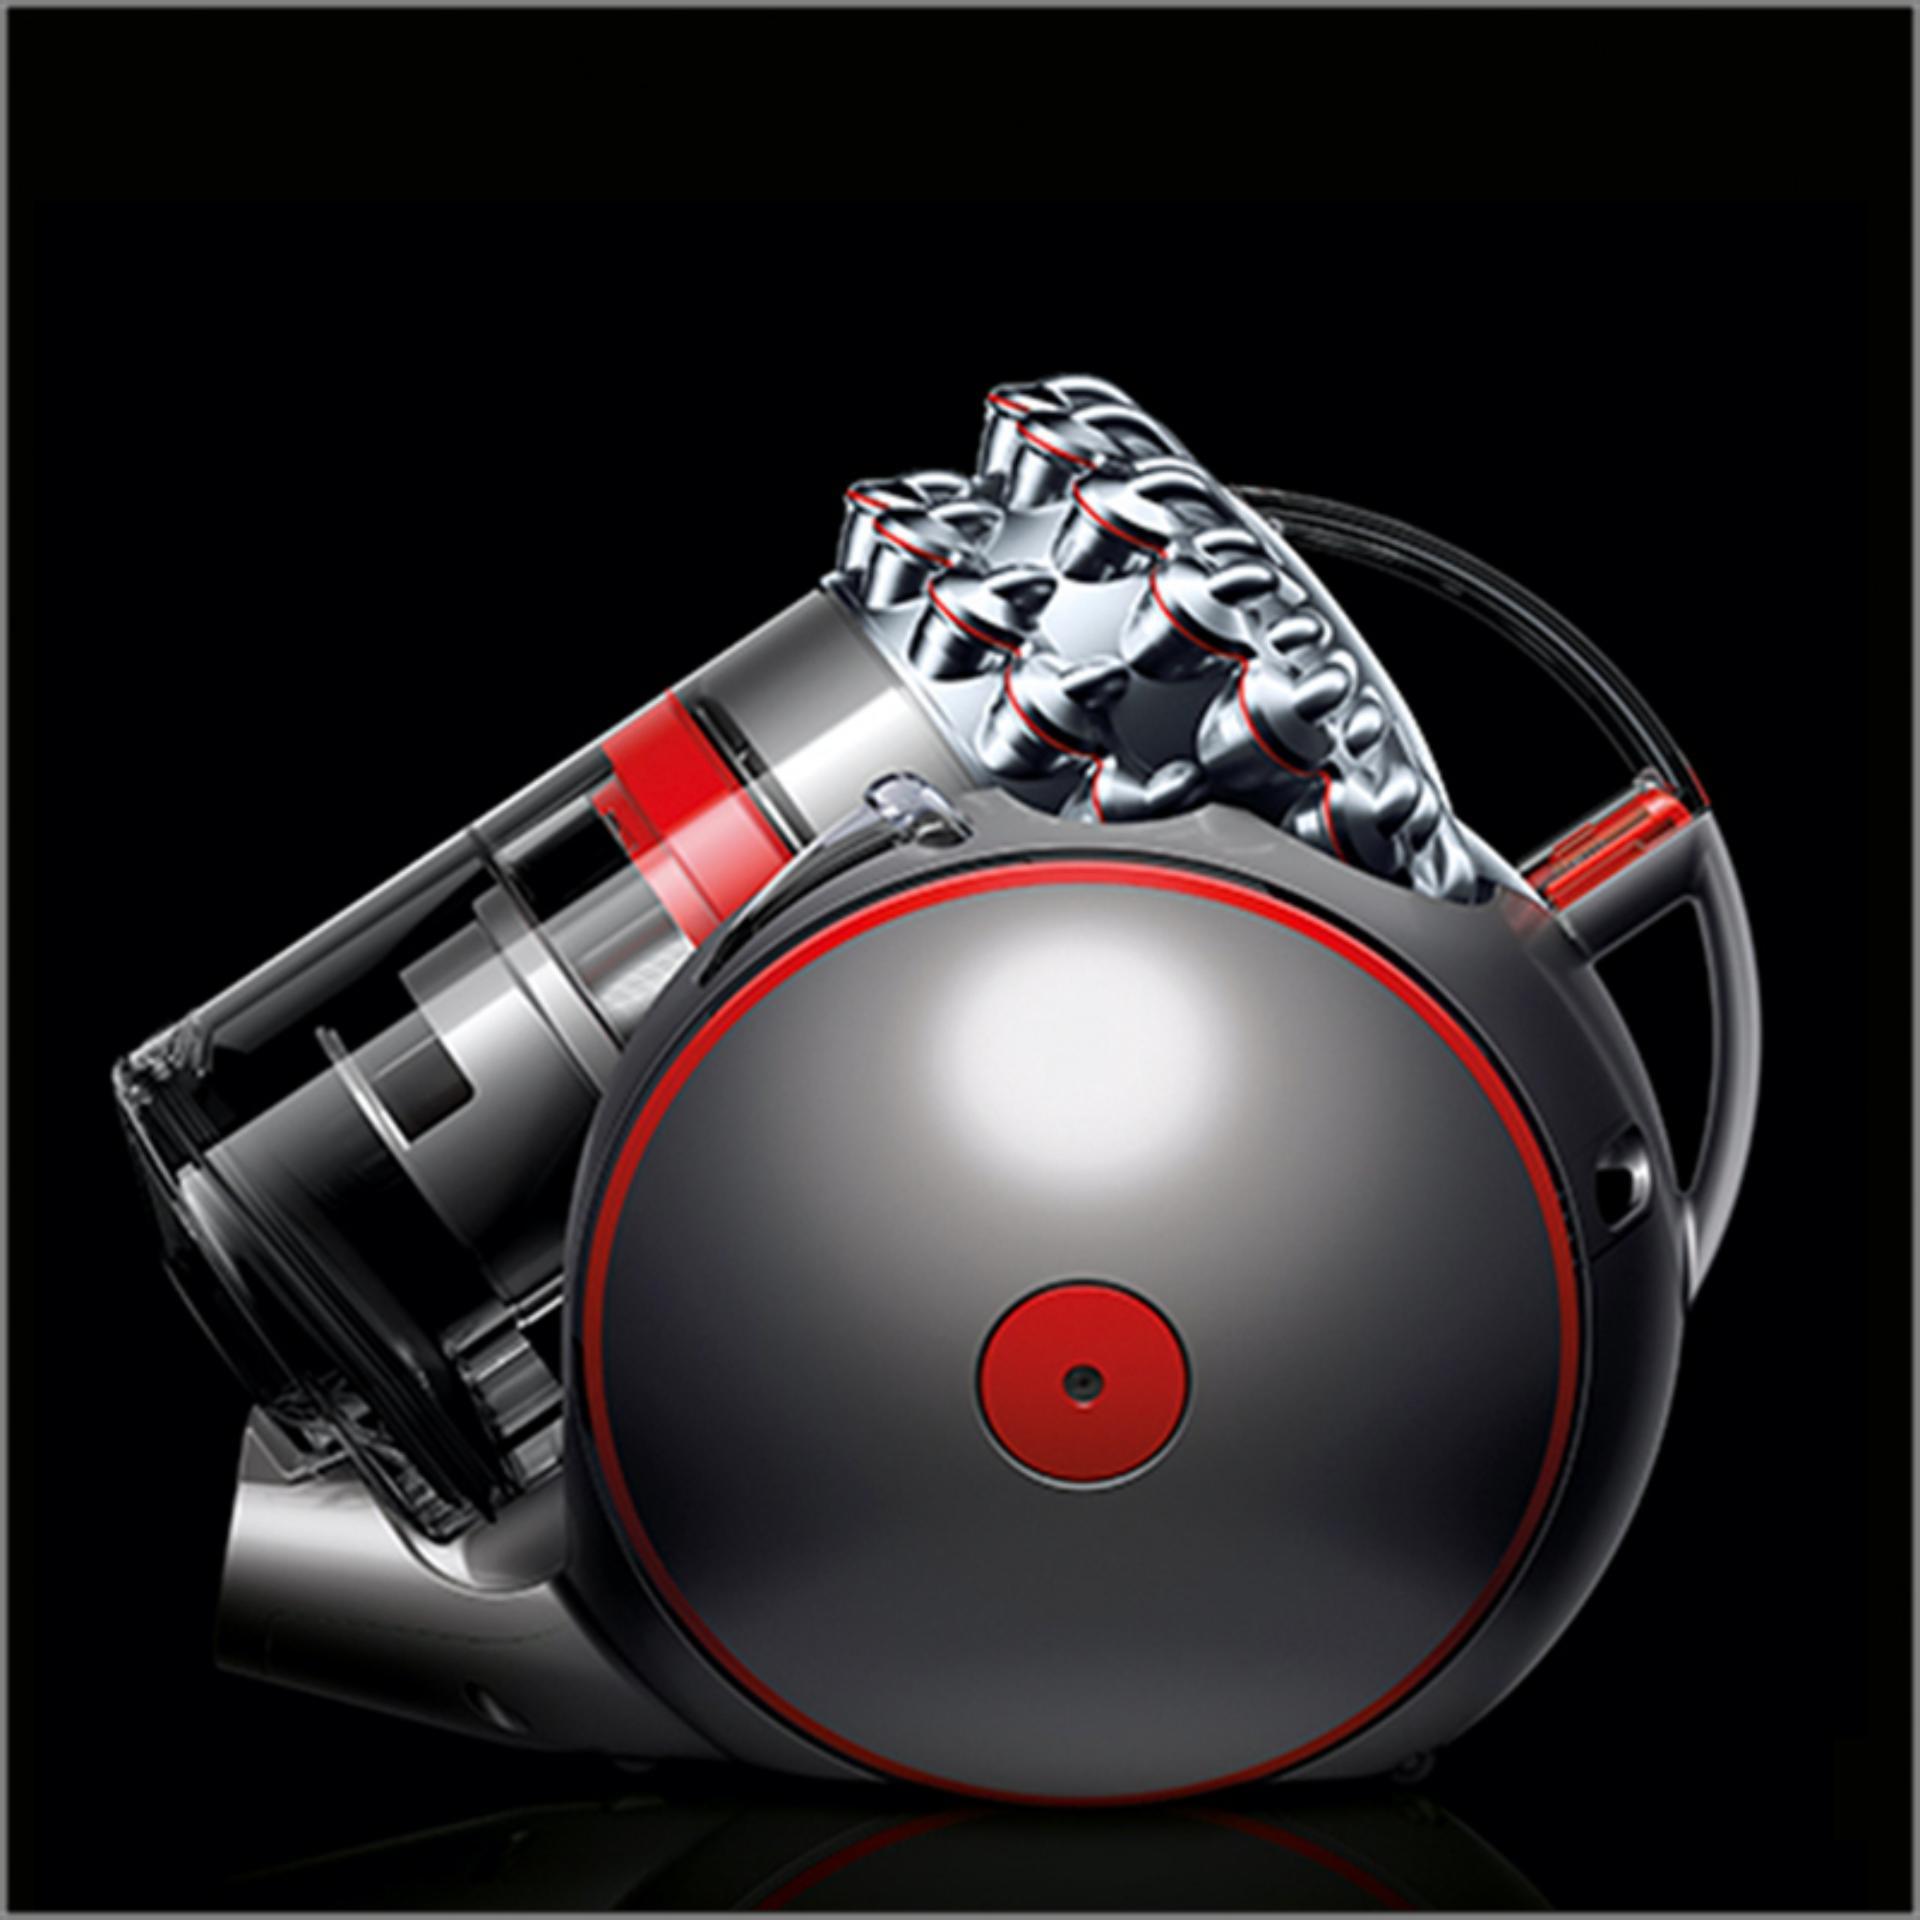 Dyson Cinetic Big Ball Absolute™ kablosuz süpürge